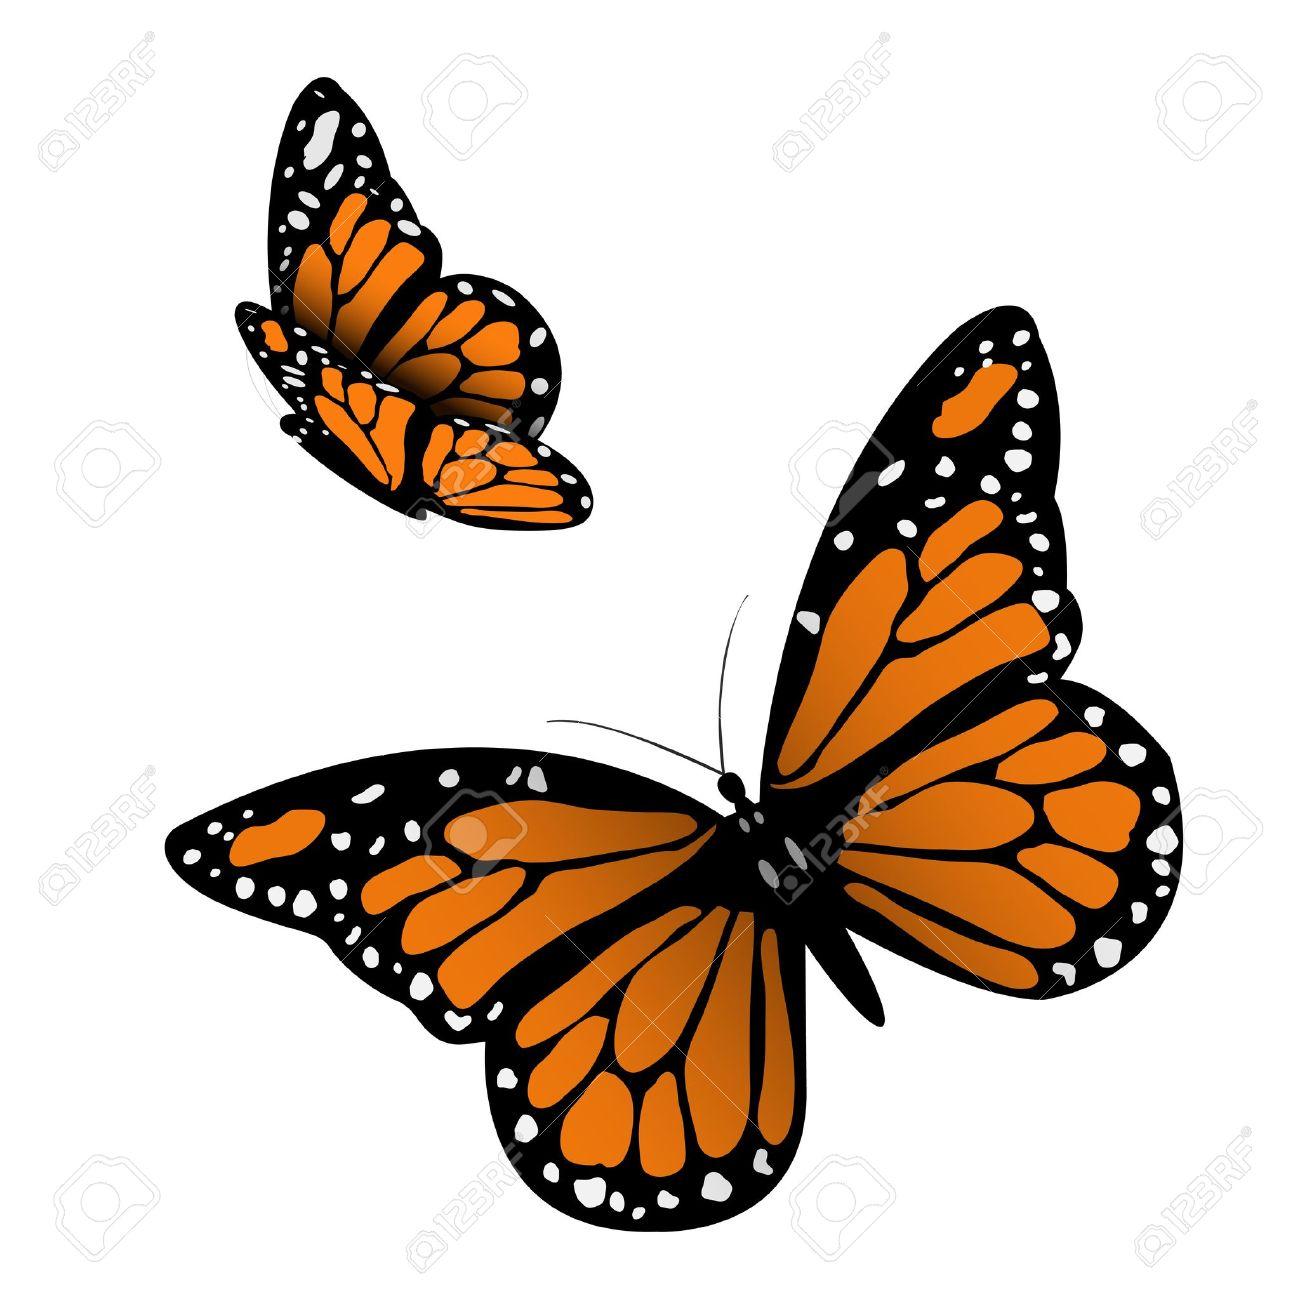 Butterfly Clipart Jpg.